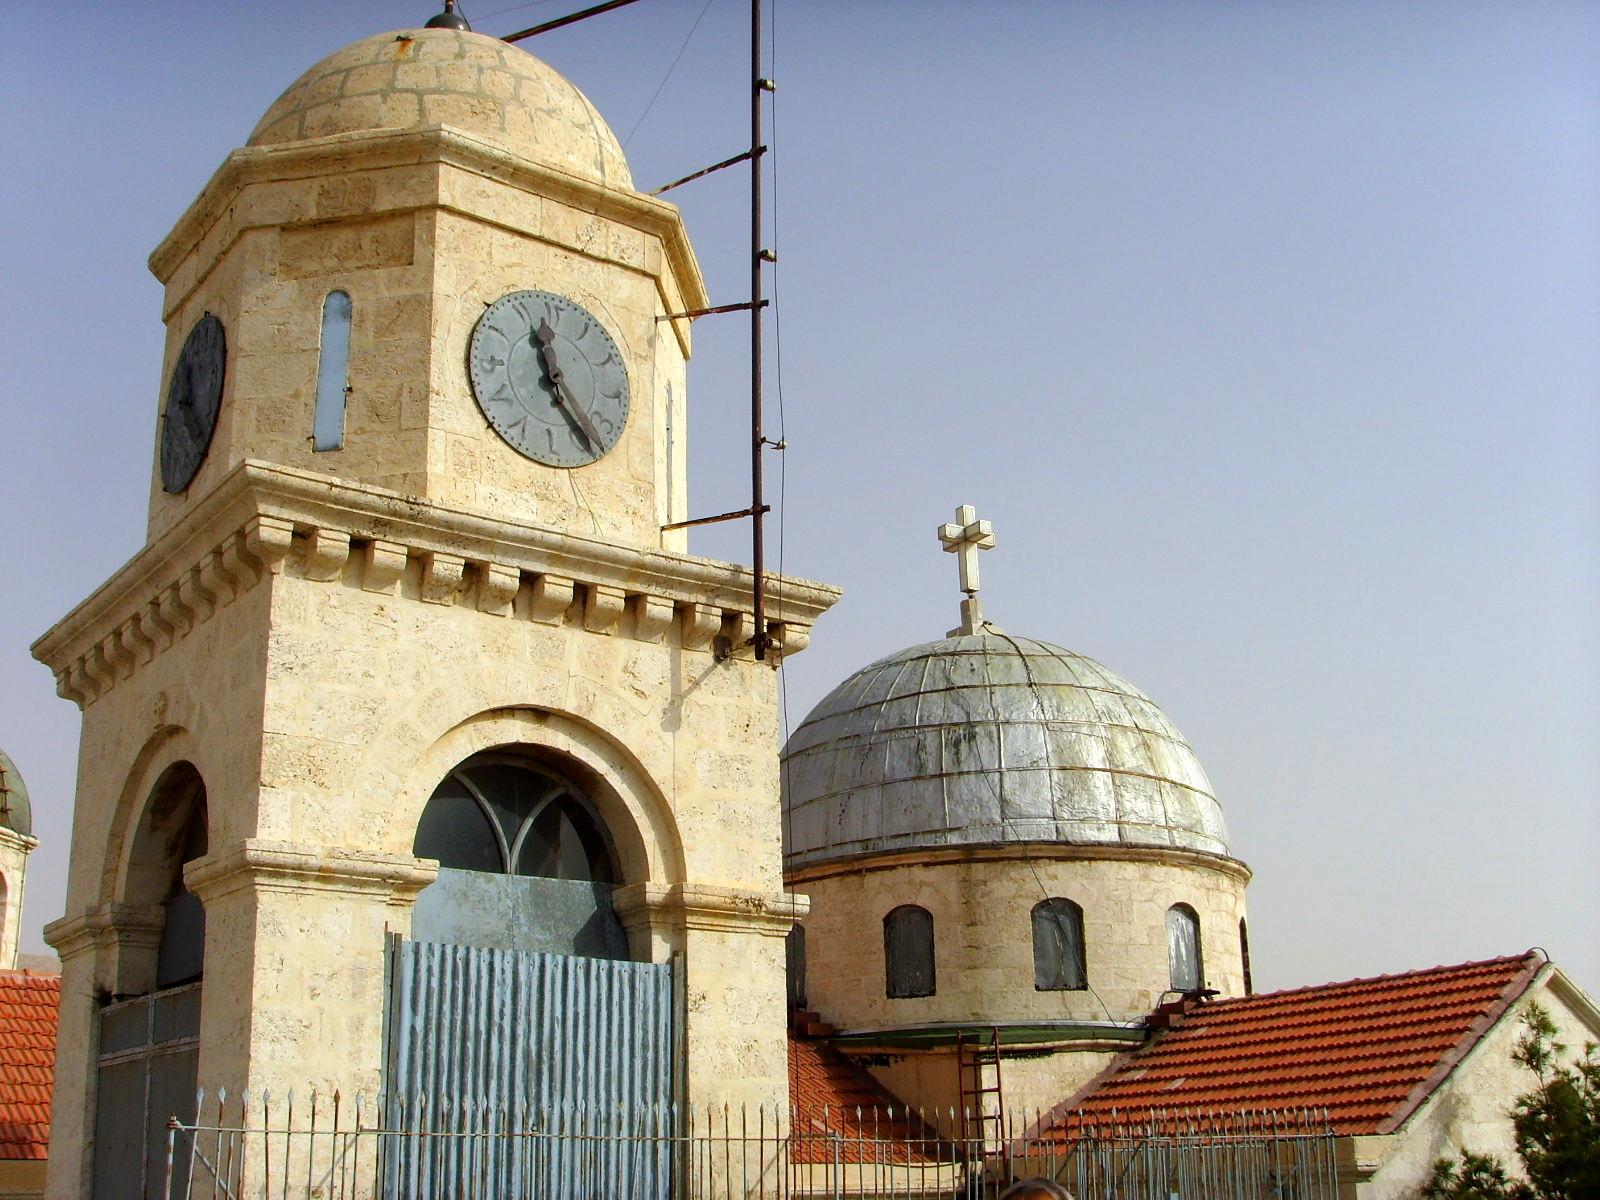 Monastery of Saint Serge in Maaloula (Syria)